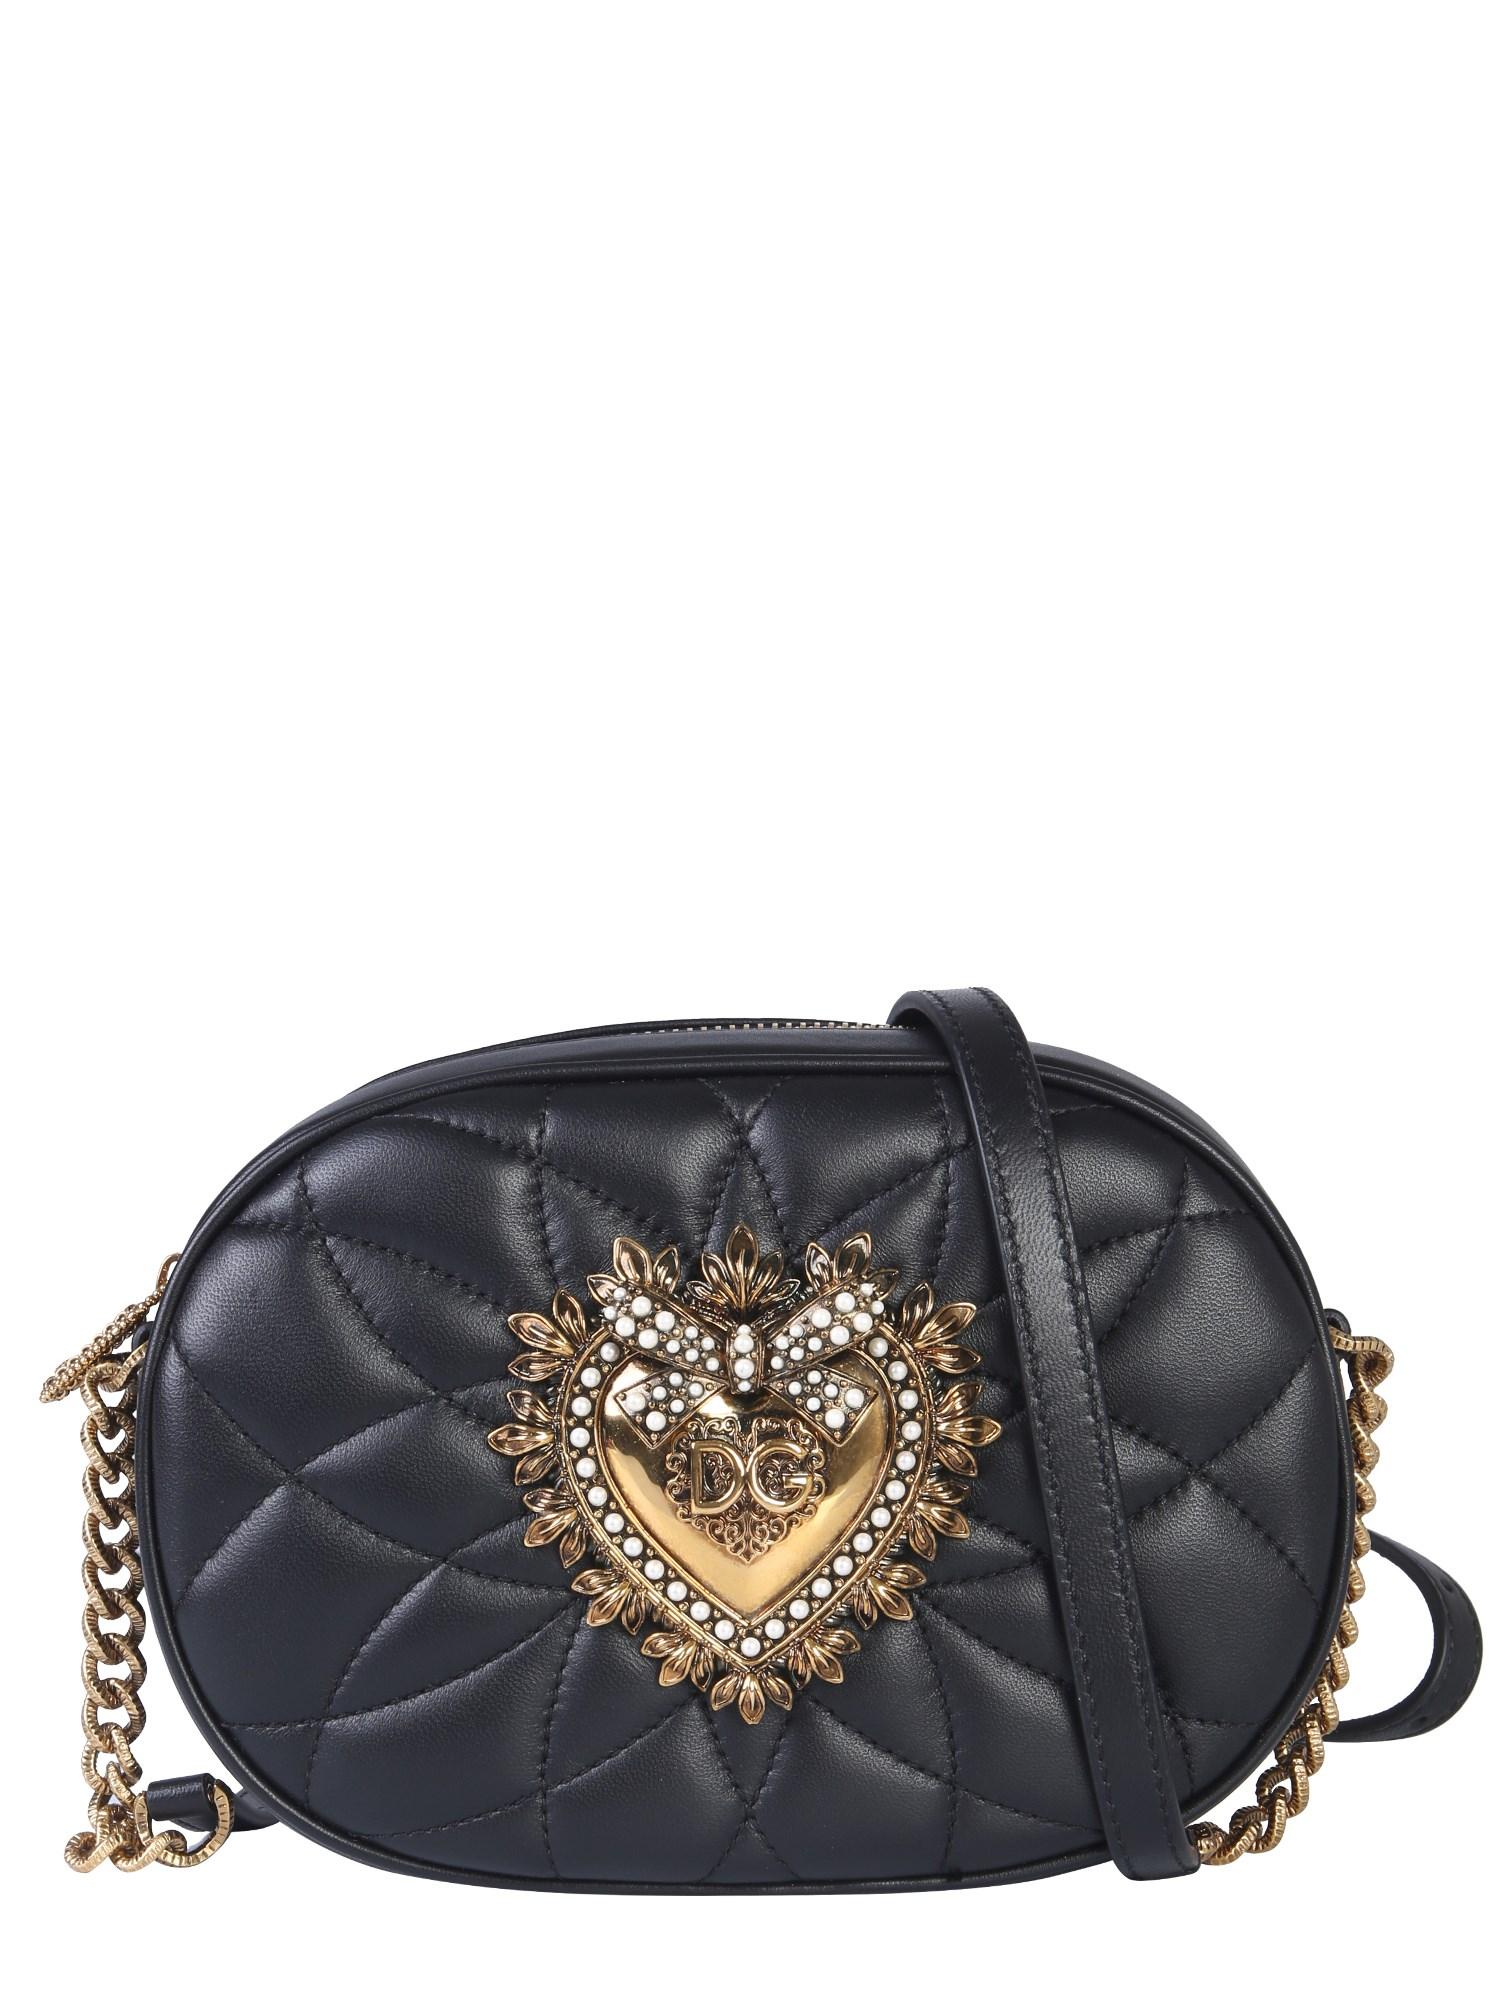 Bolsa Devotion em pele Dolce Gabbana